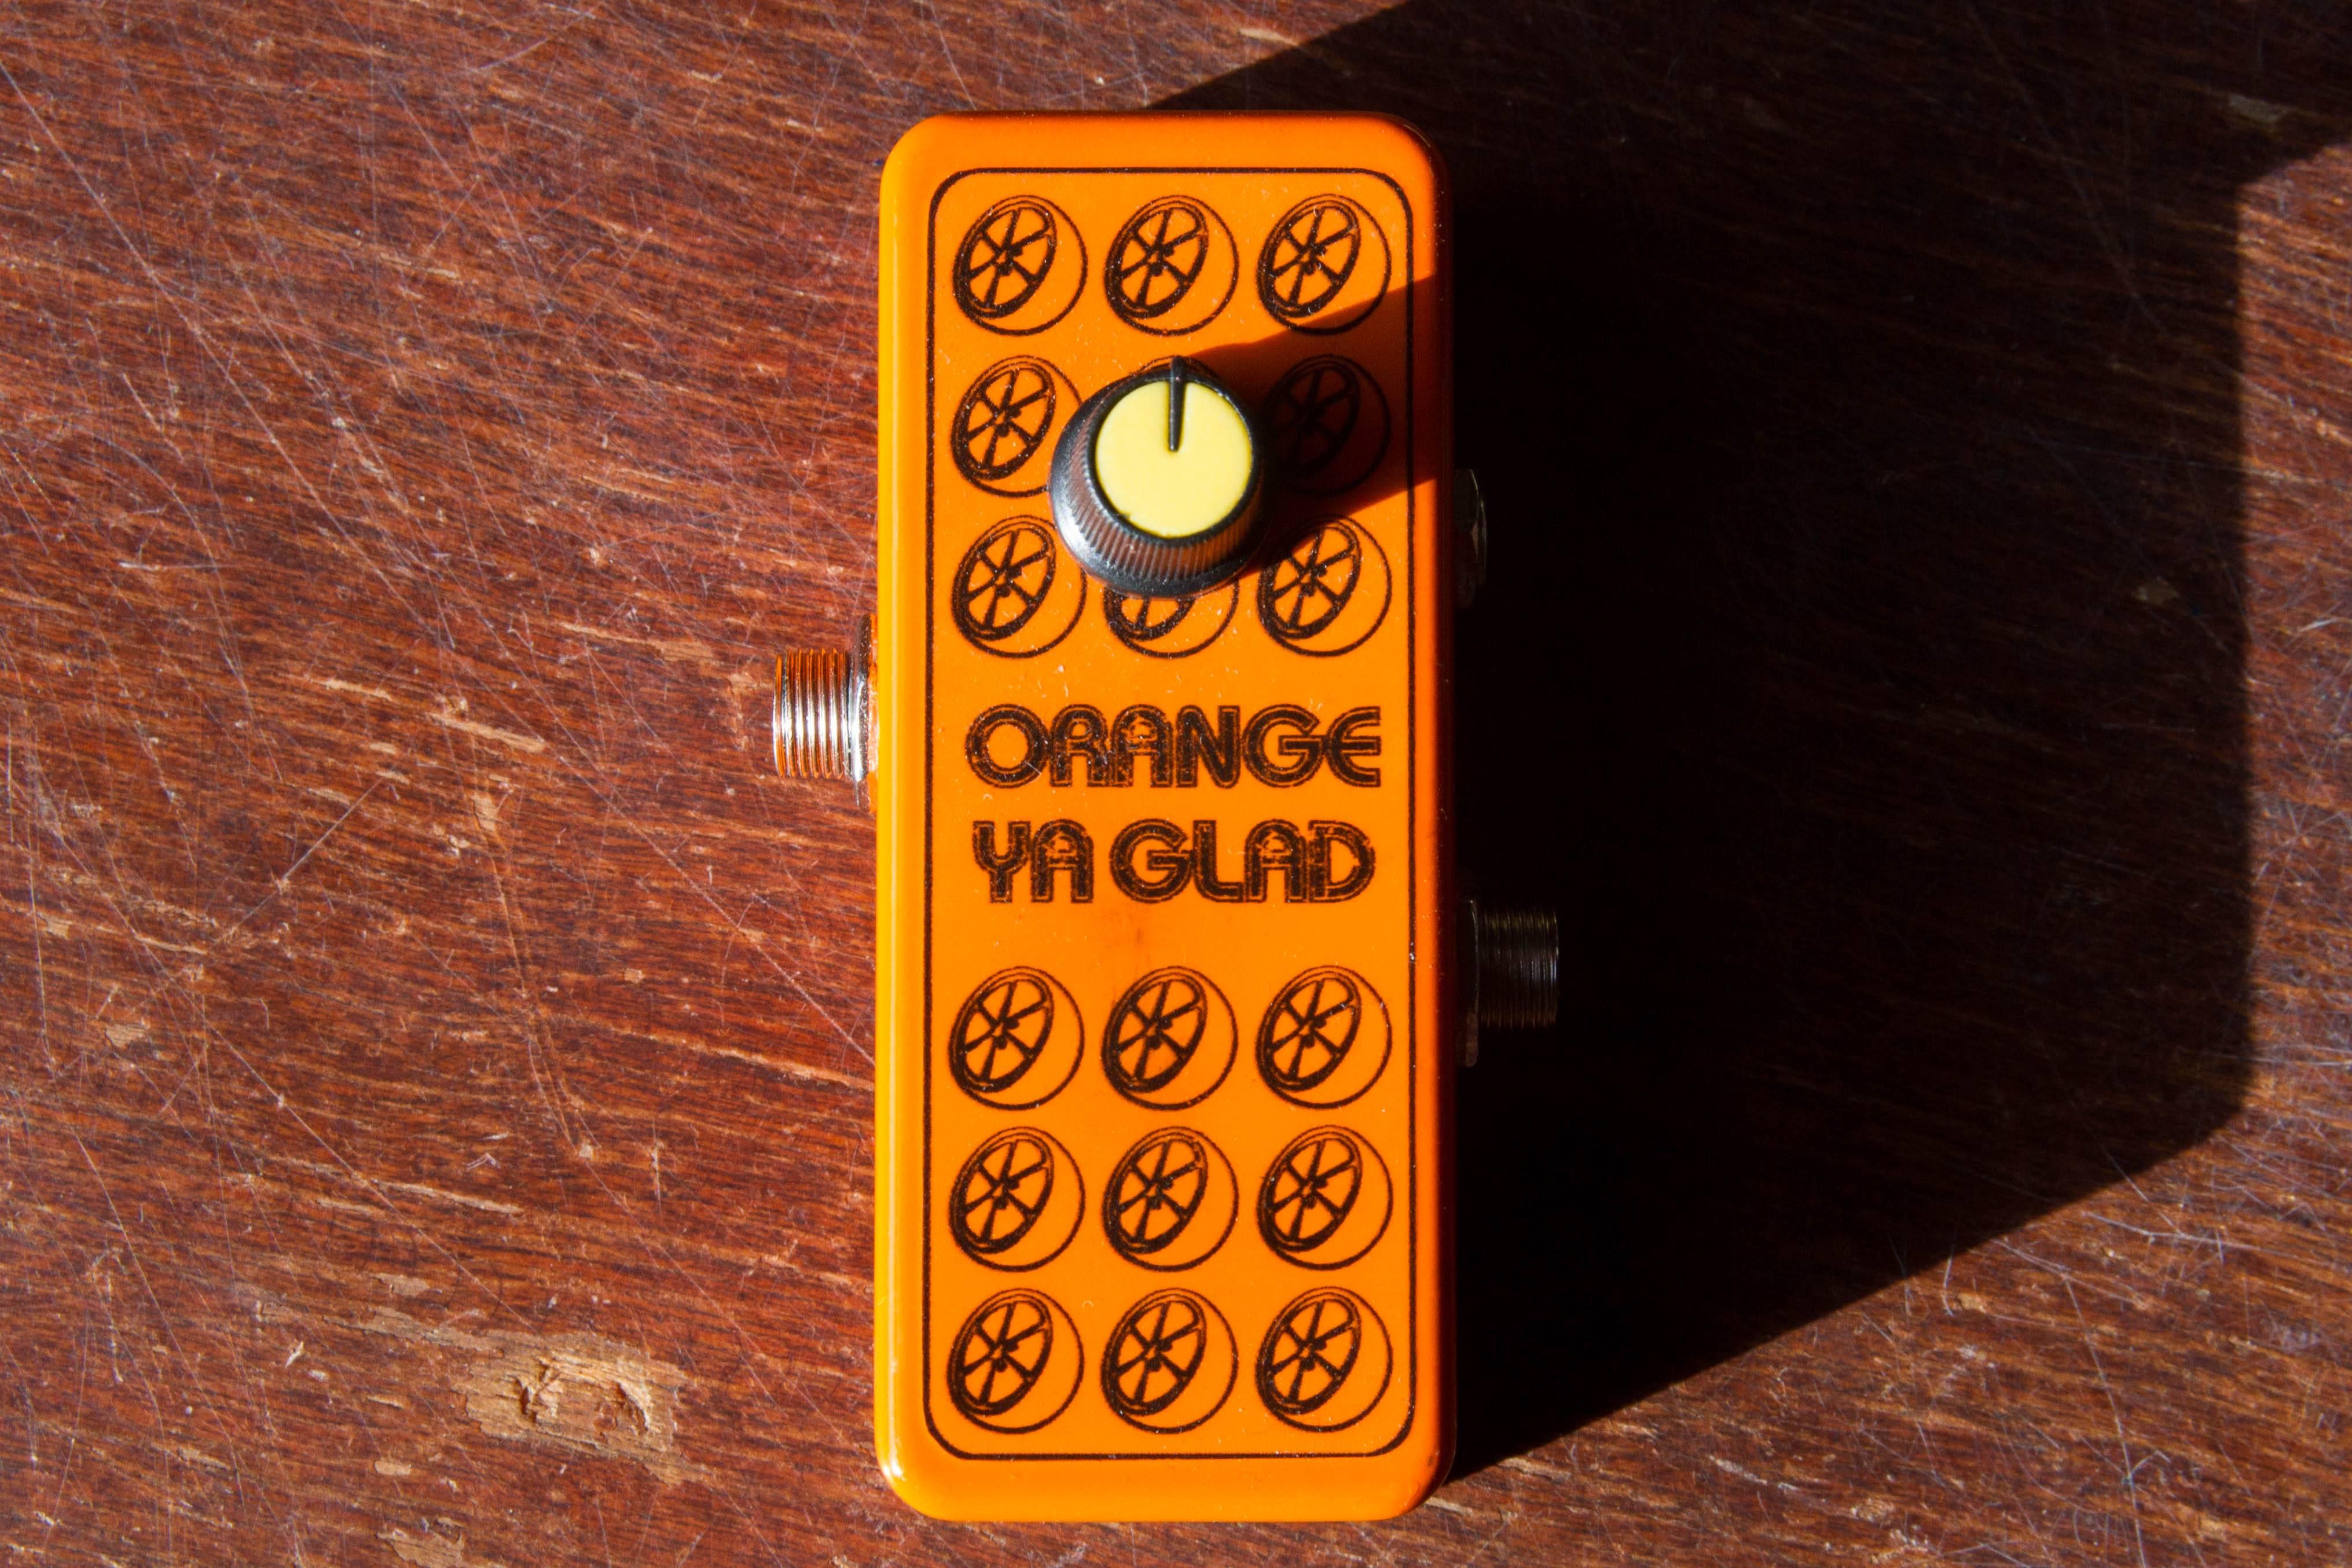 orangeyaglad2